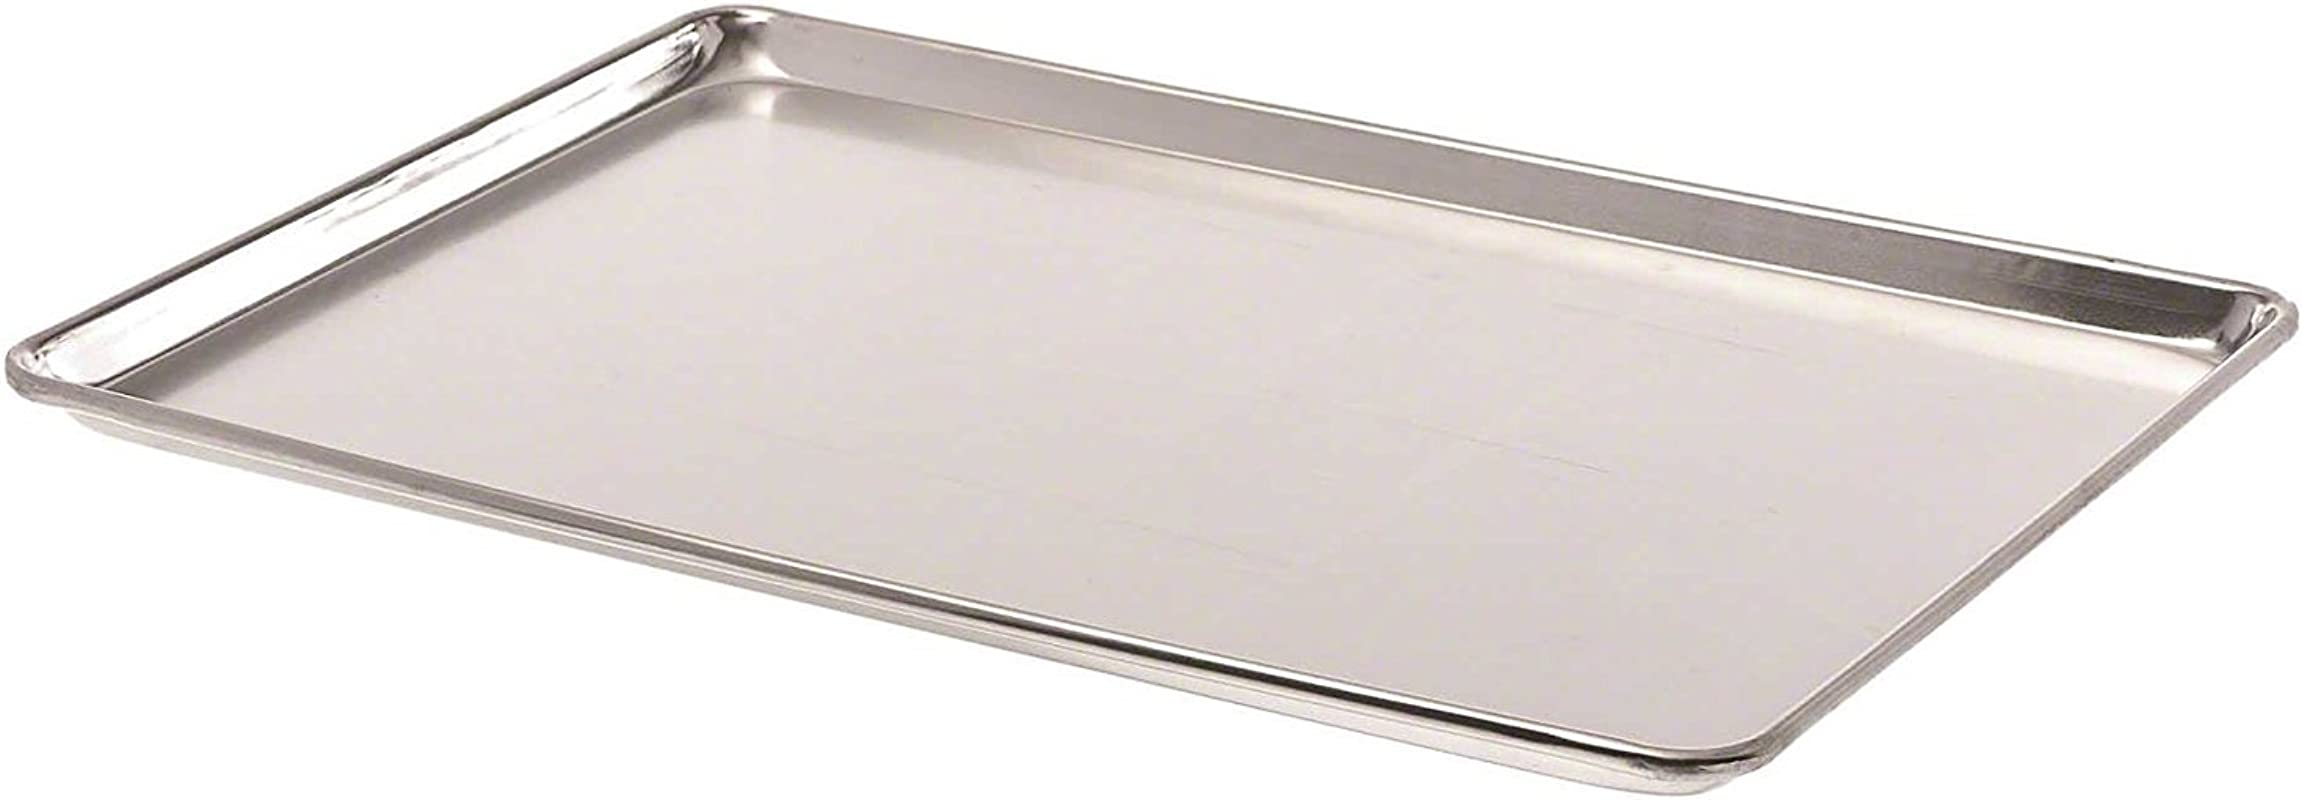 Browne 18 X 26 Full Size Thermalloy Aluminum Bun Pan